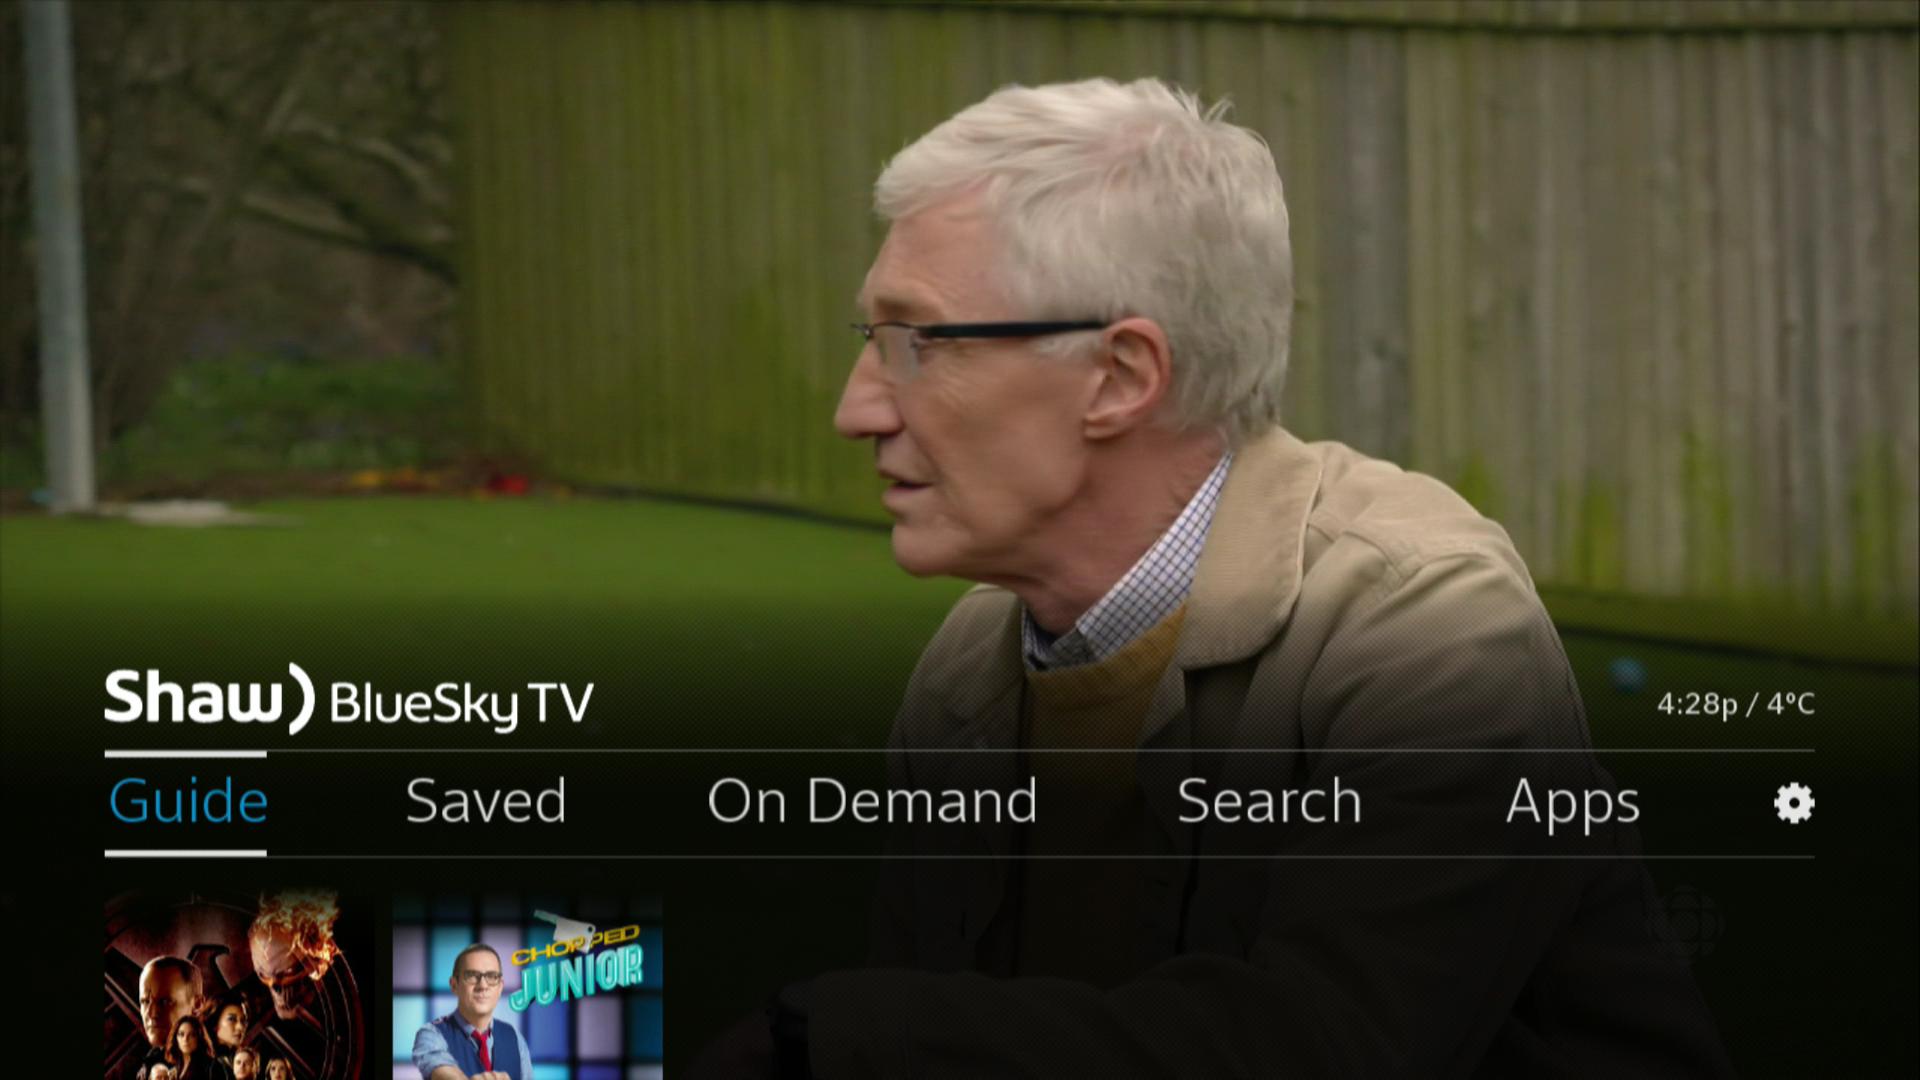 BlueSky TV > Menu > Guide